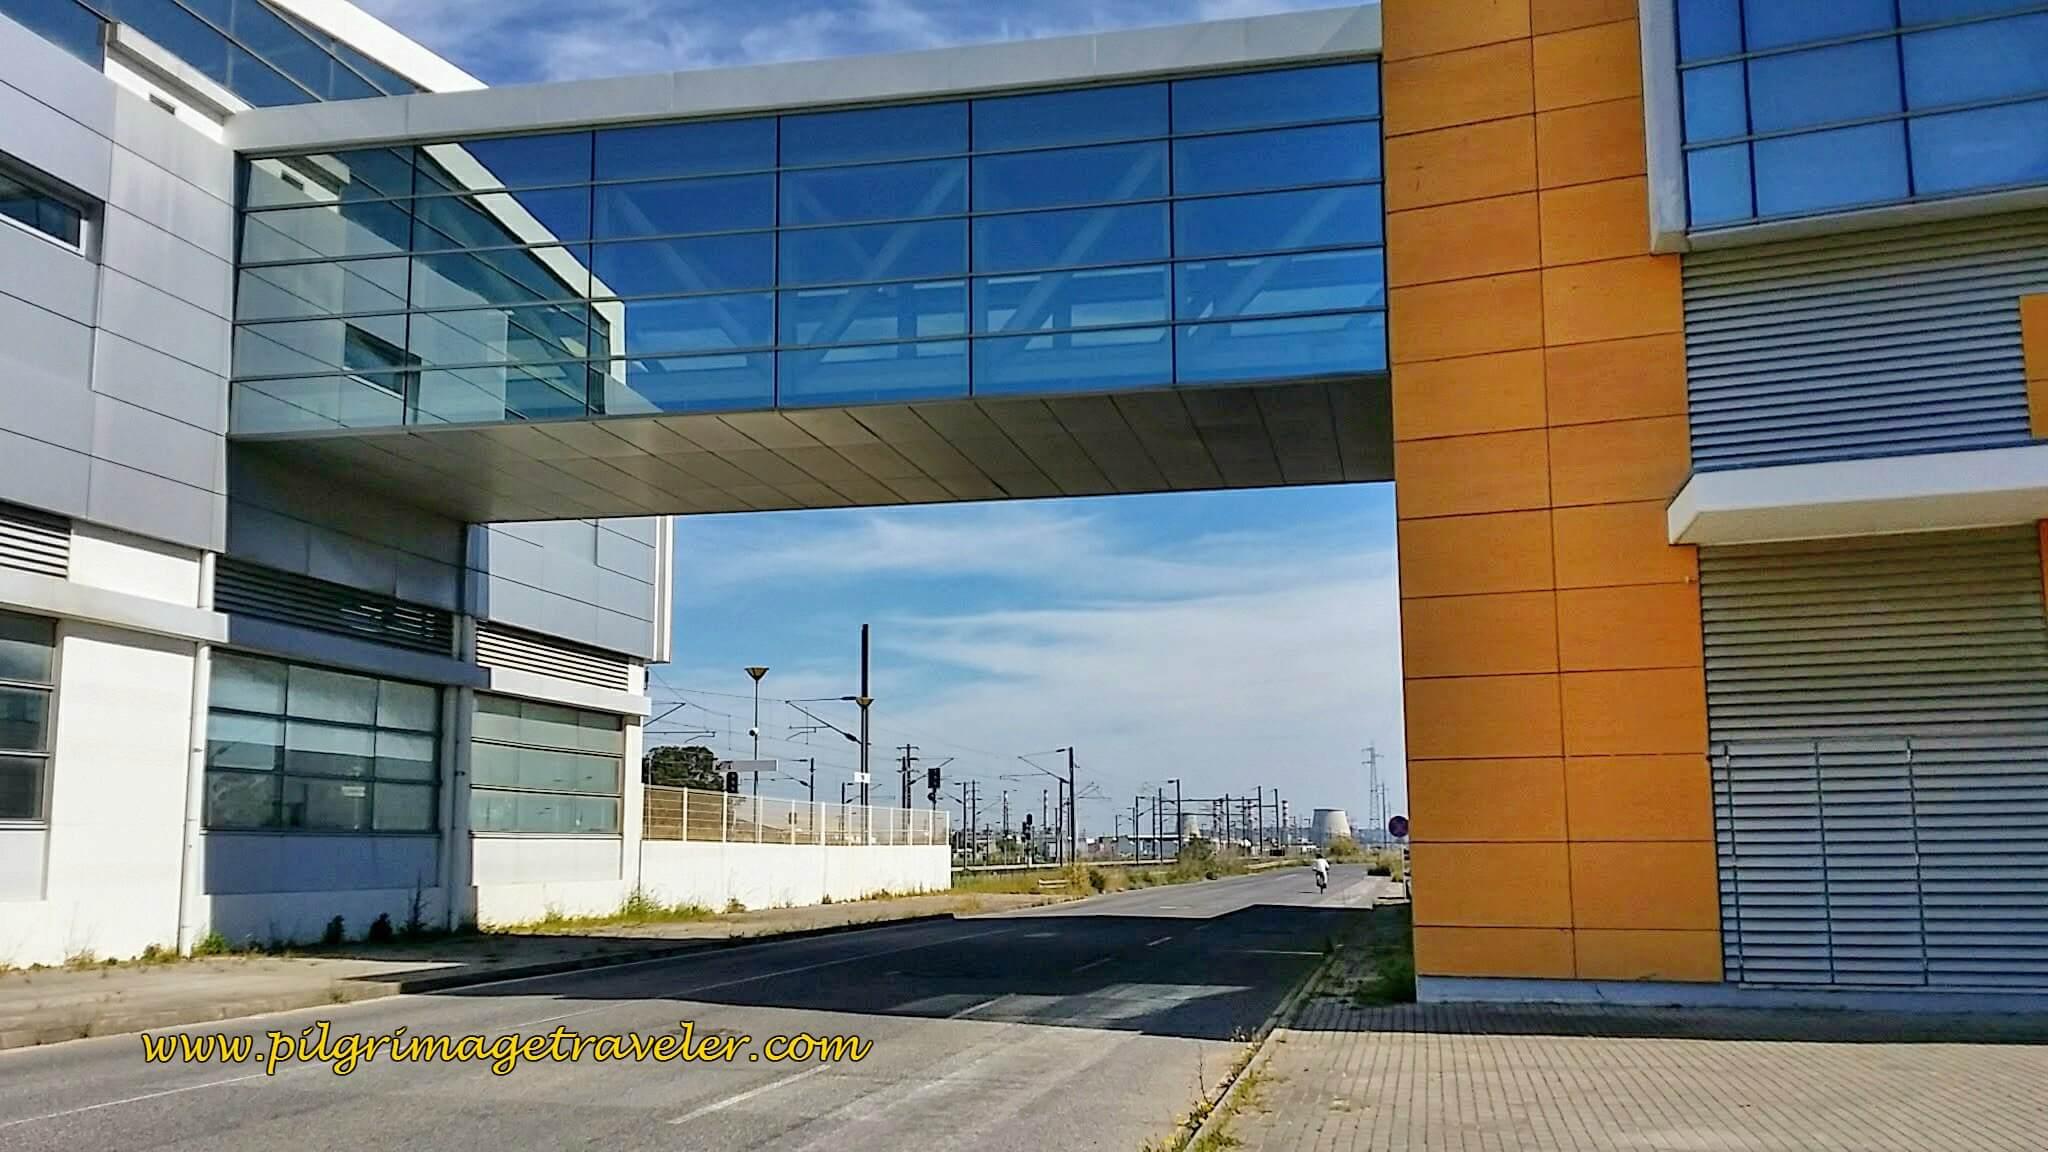 Castanheira do Ribatejo Train Station along the Portuguese Way